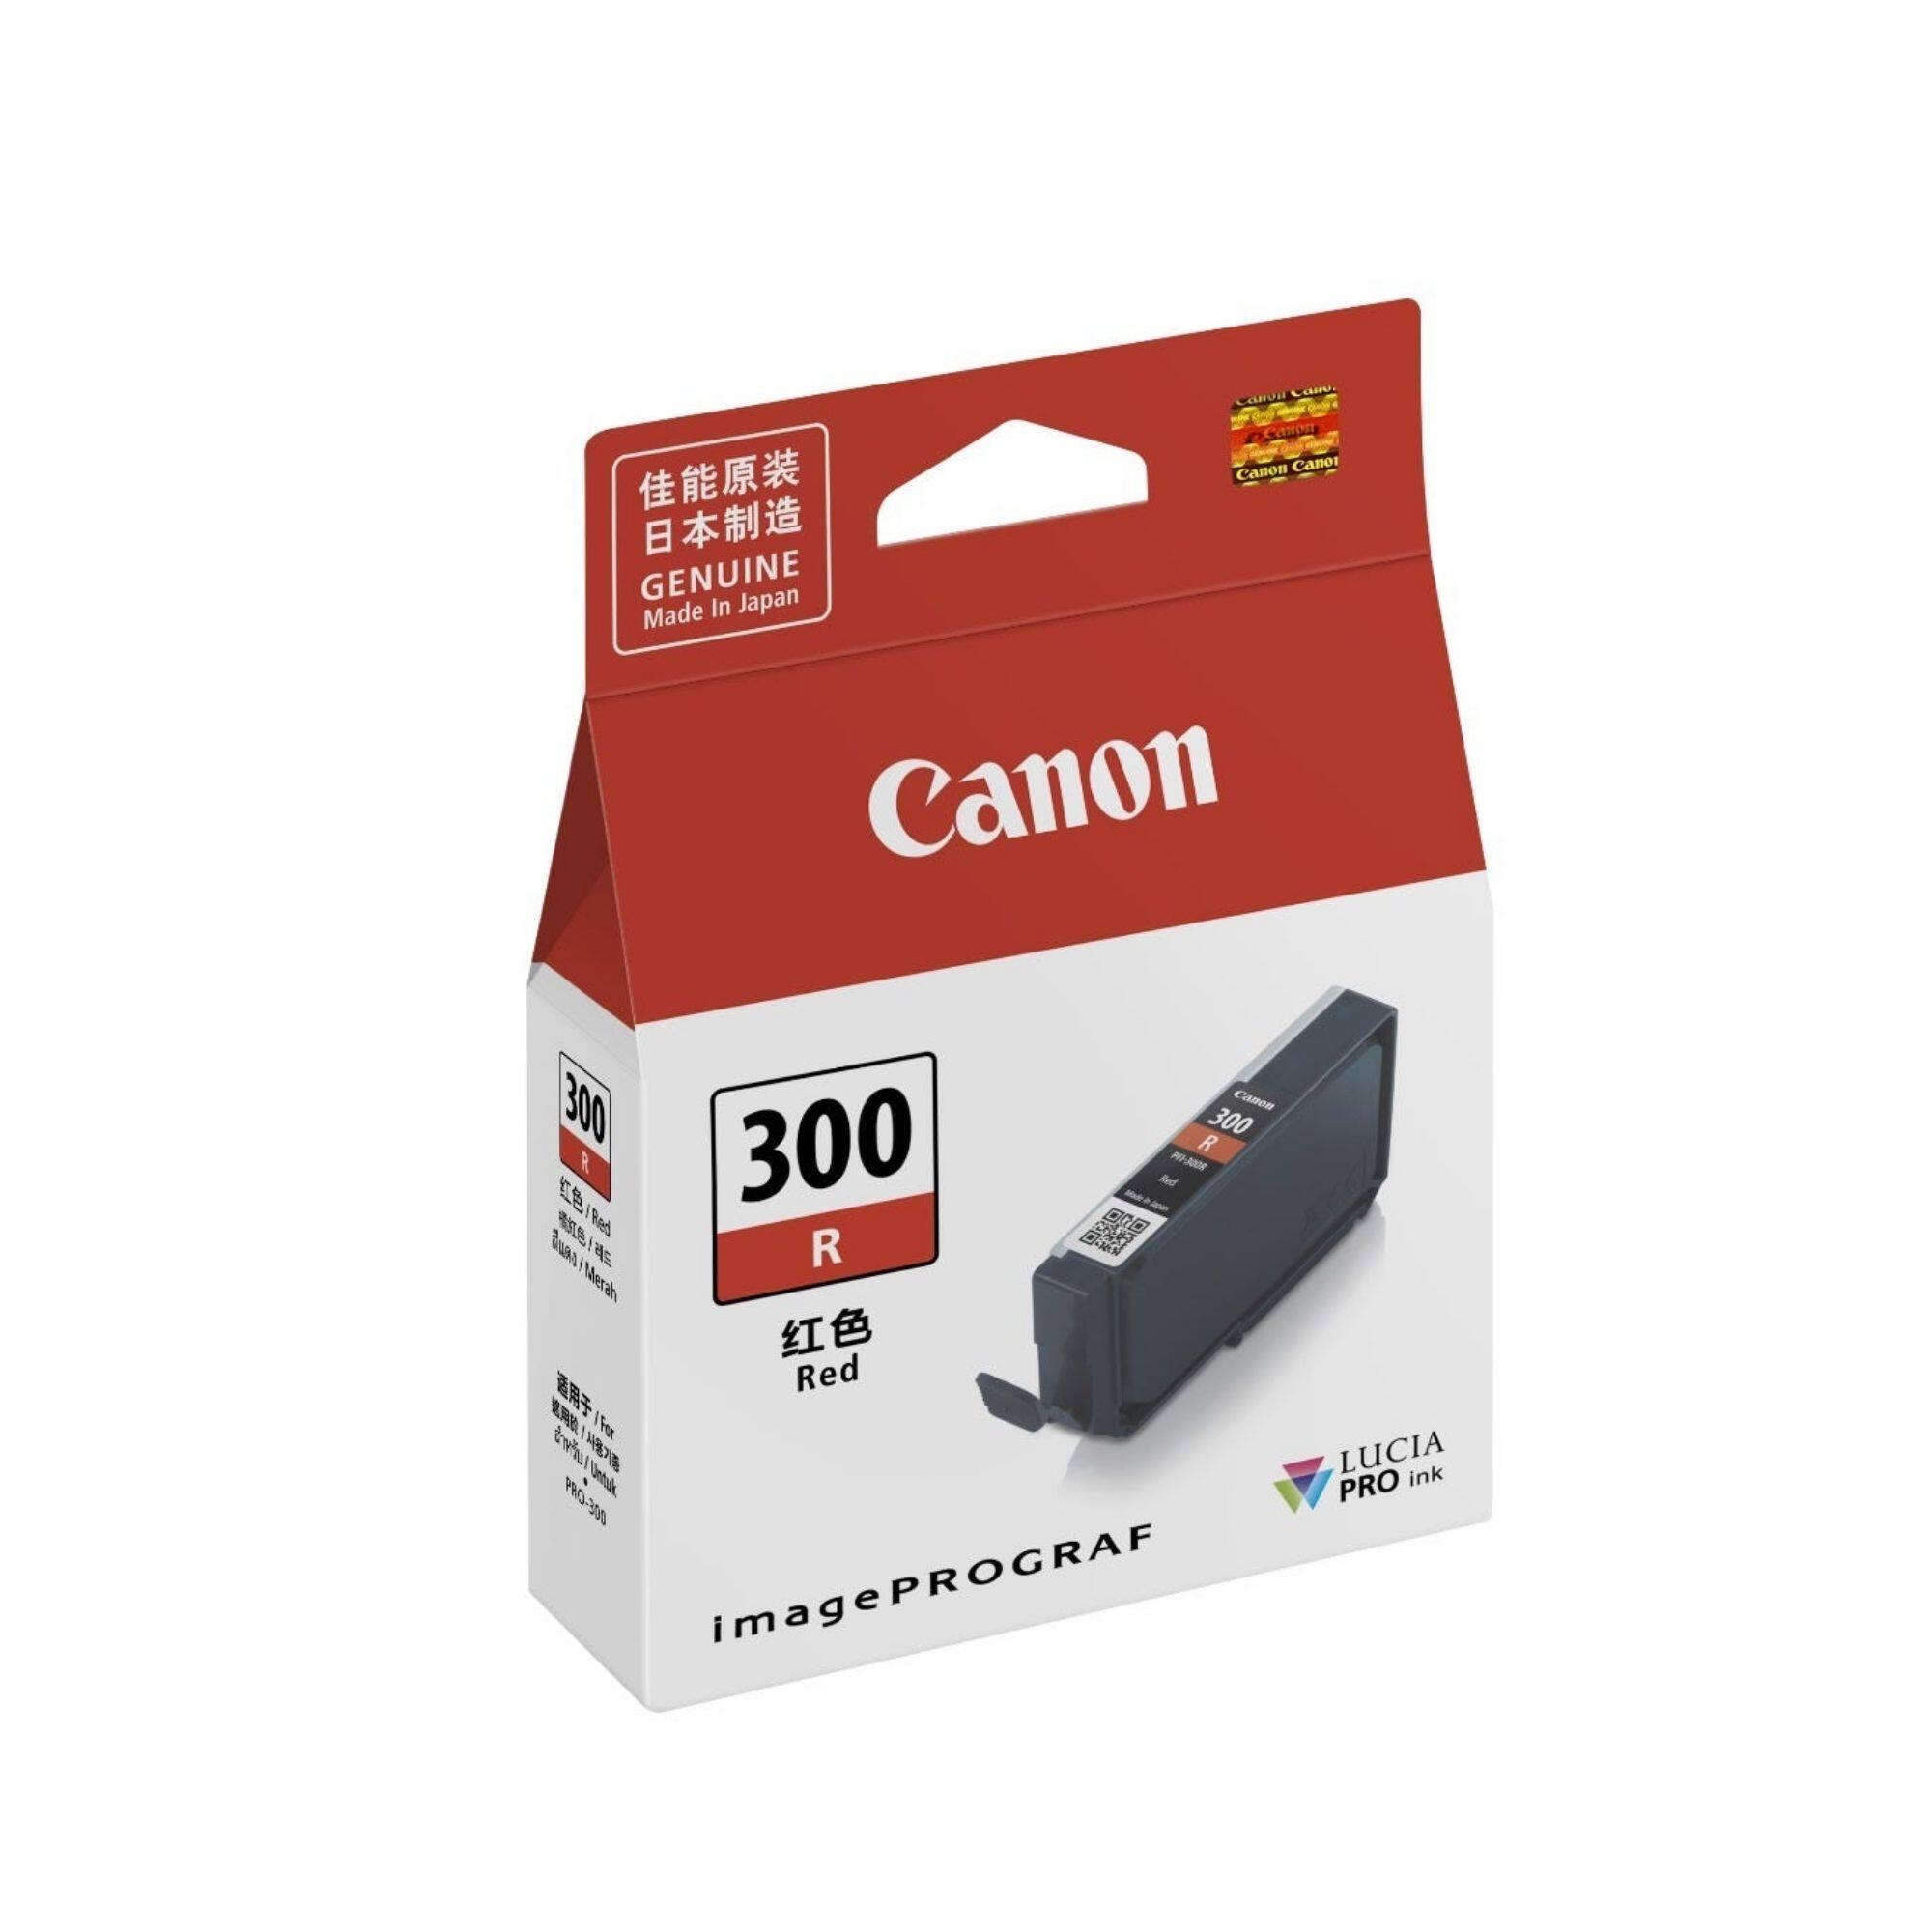 Canon PFI-300 Red Cartridge (14.4 ml) for PRO-300 Printer